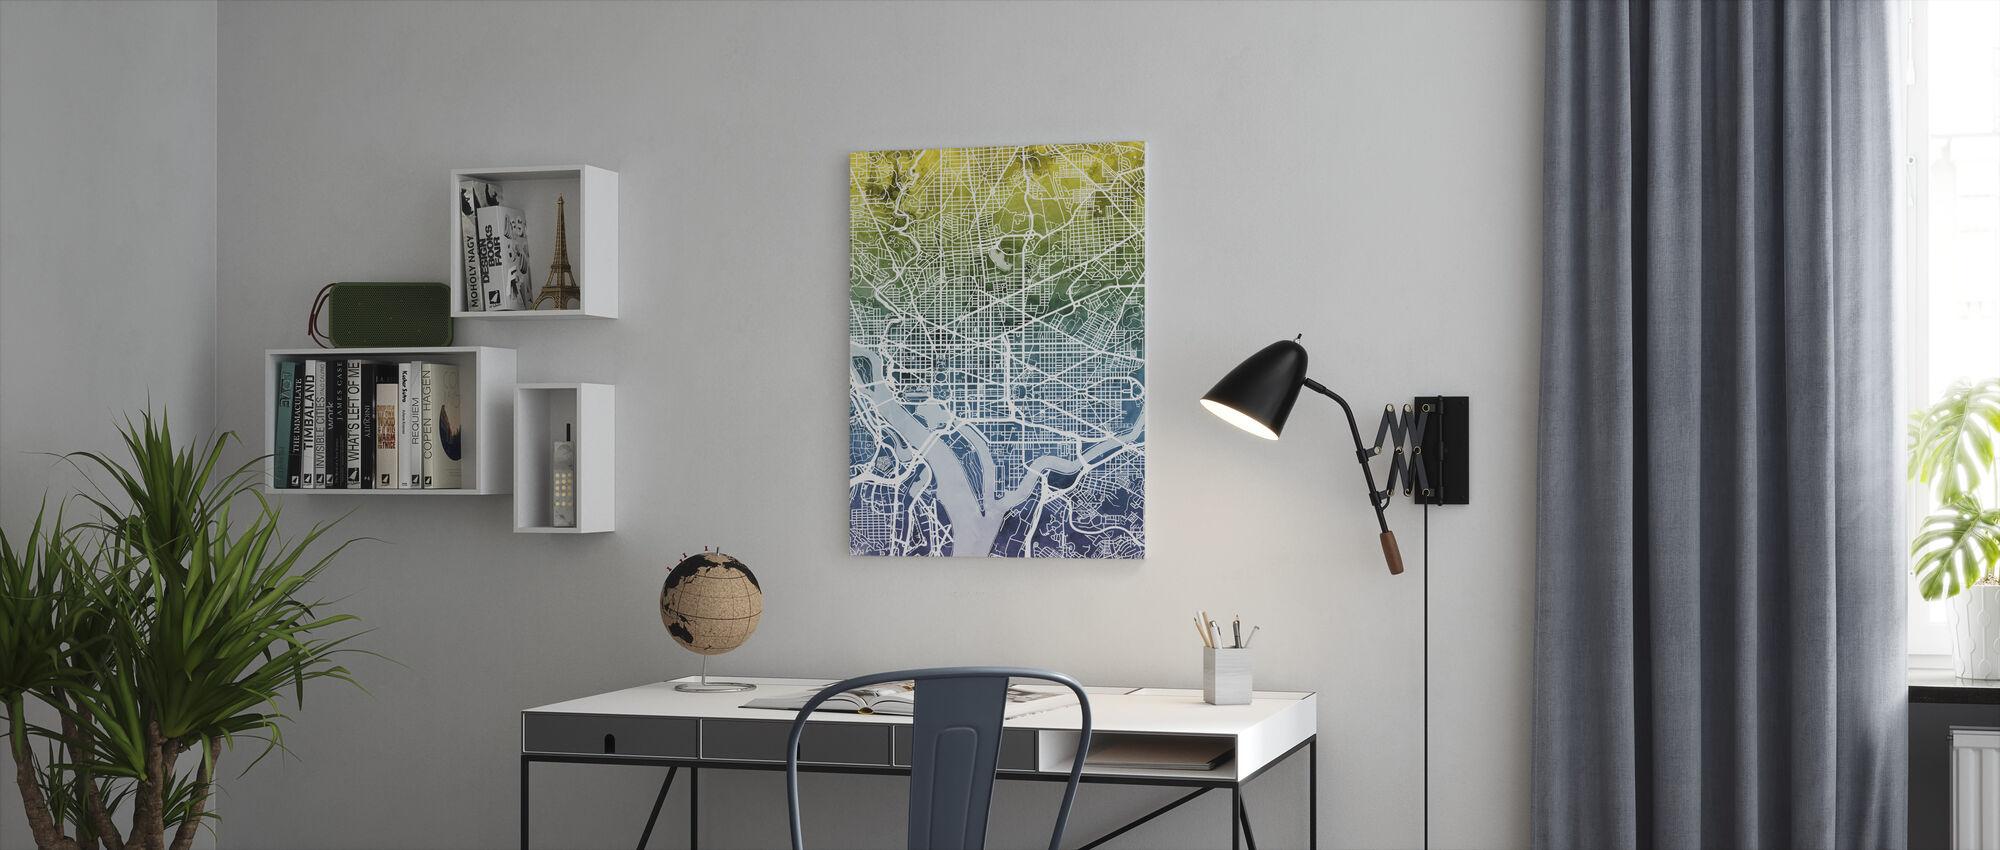 Washington DC Street Karta Bluegreen - Canvastavla - Kontor